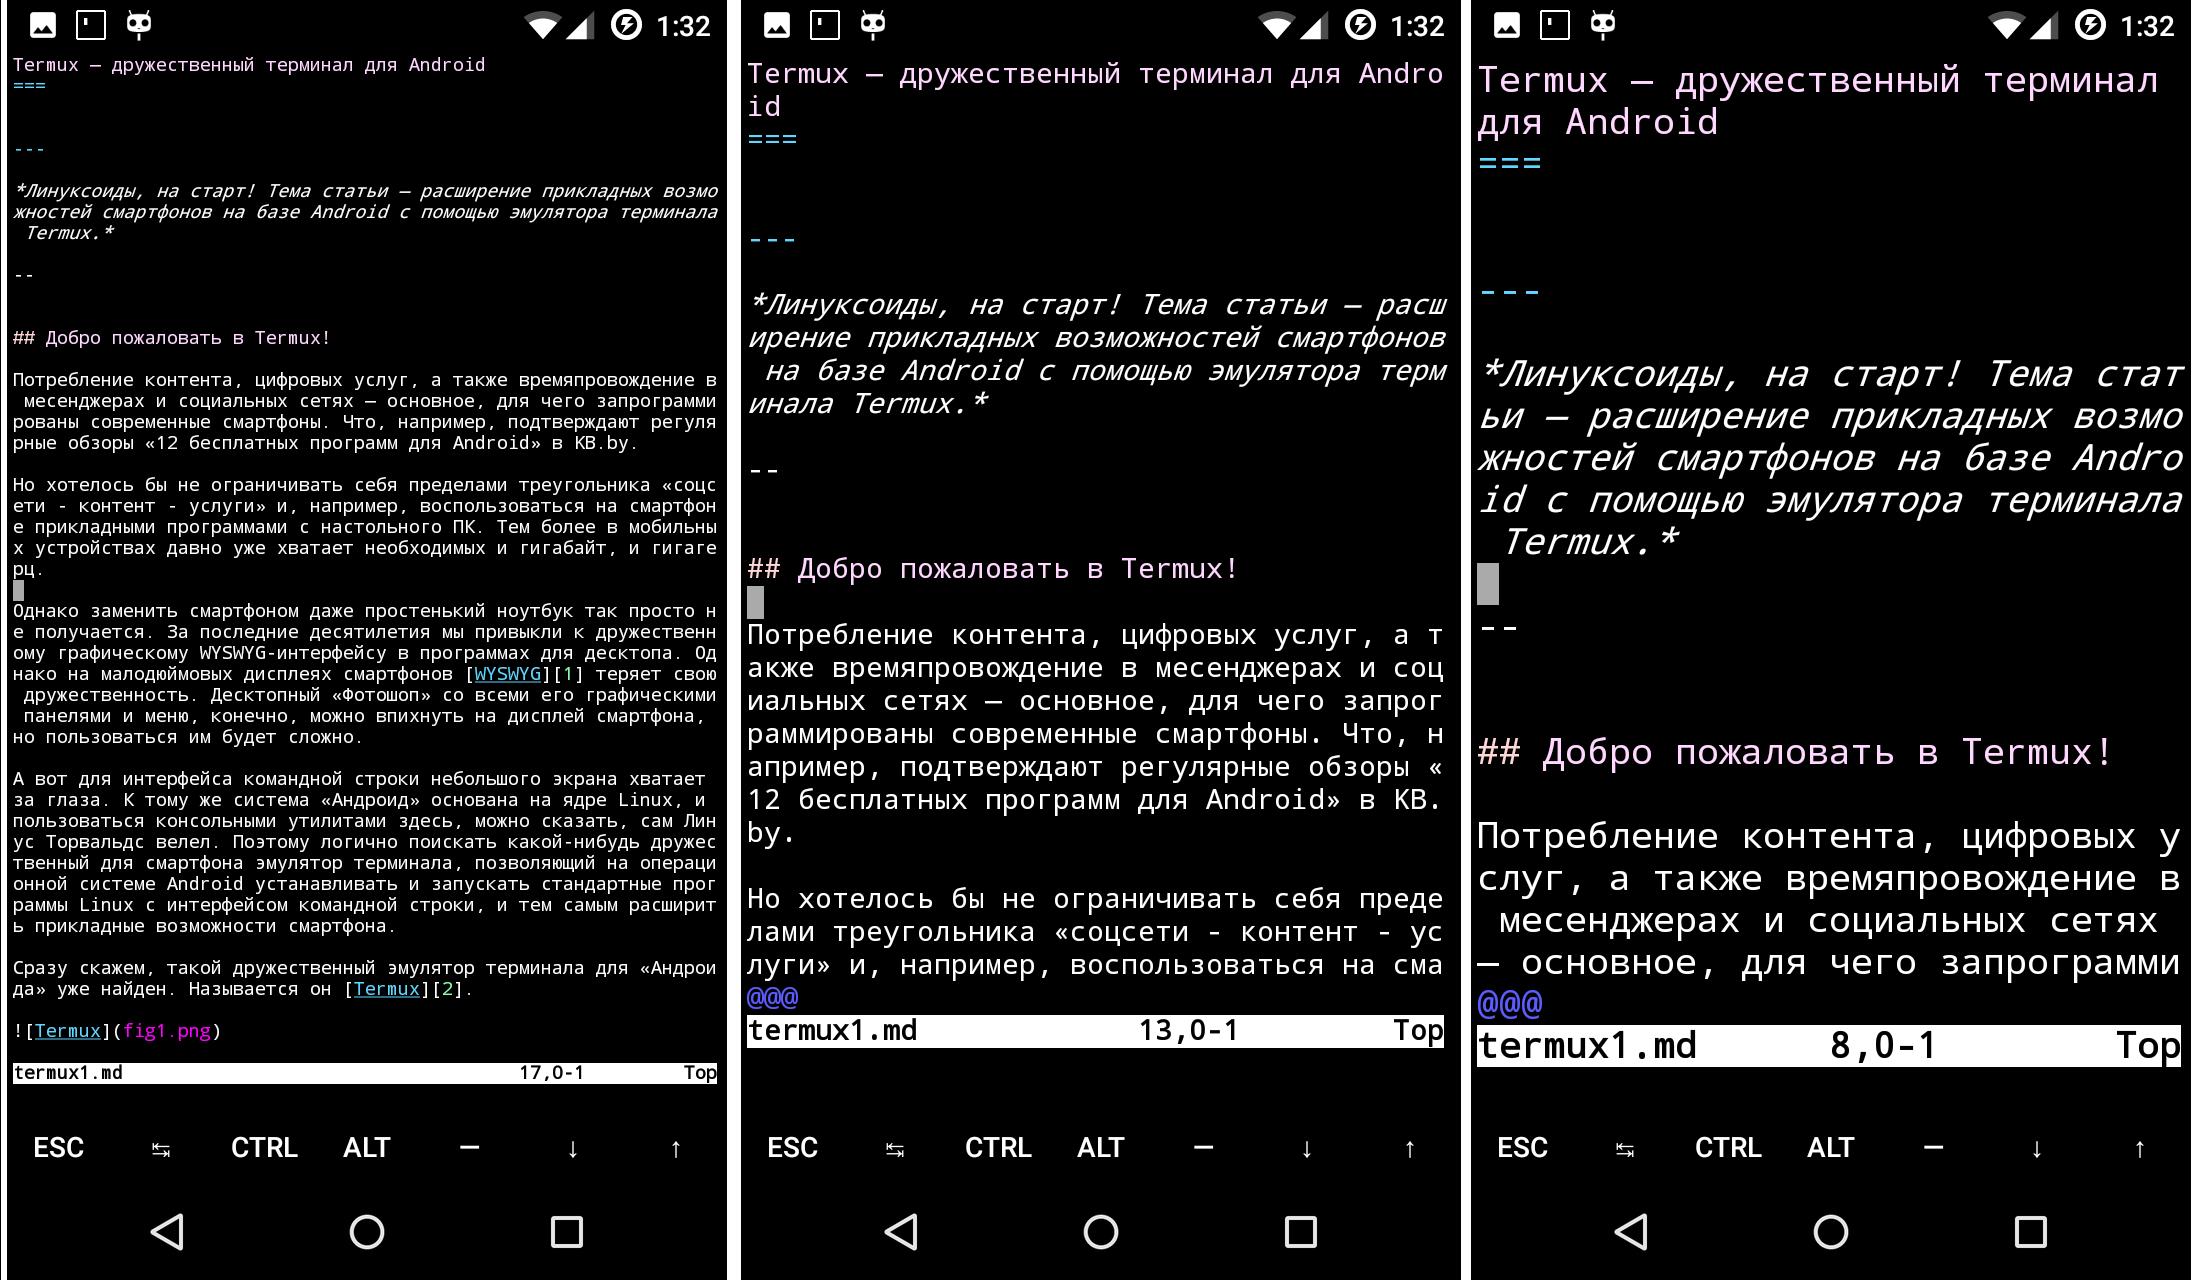 Termux: дружественный терминал для Android | KV by